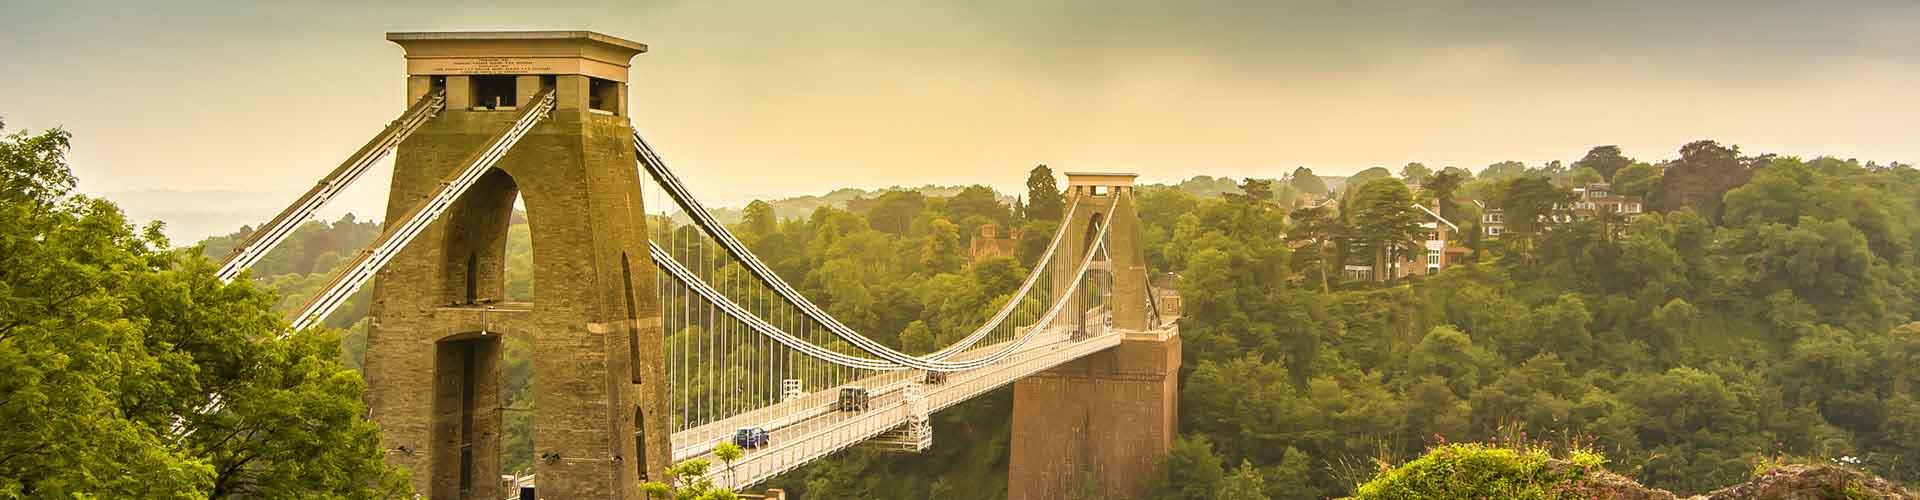 Bristol - Ubytovny v Bristol. Mapy pro Bristol, fotky a recenze pro každý Ubytovnu - Bristol.